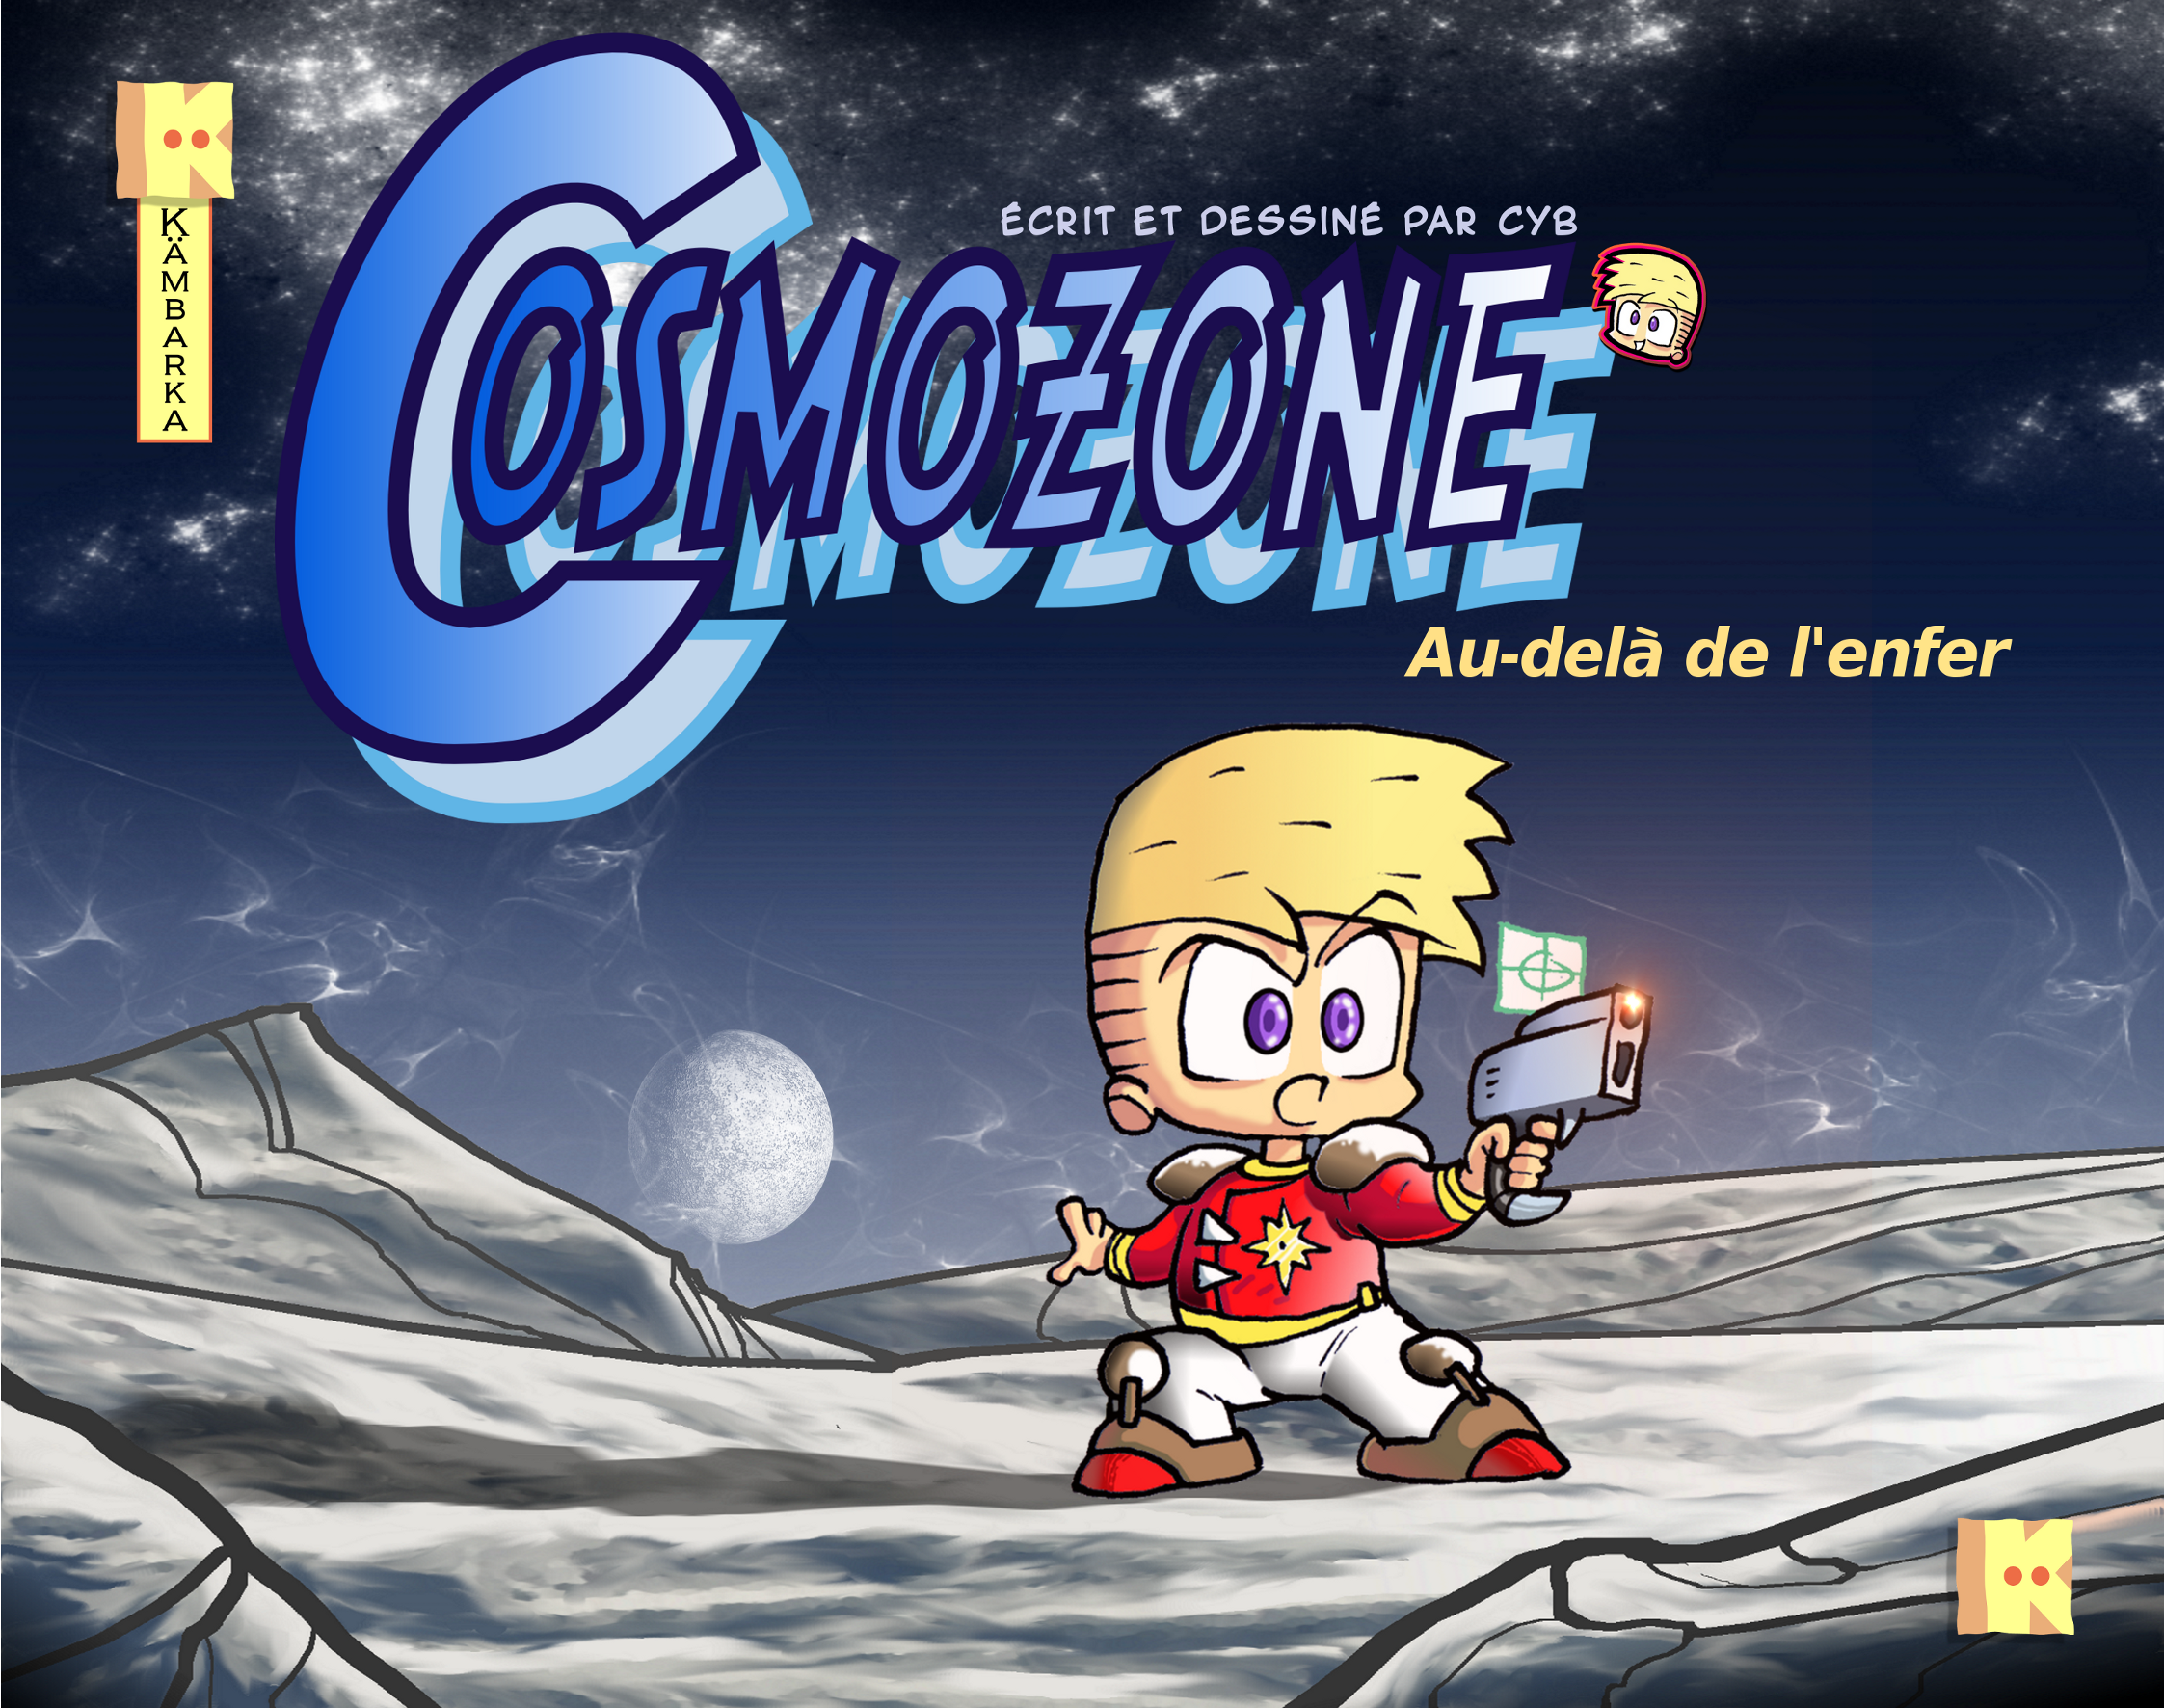 Cosmozone - au-delà de l'enfer